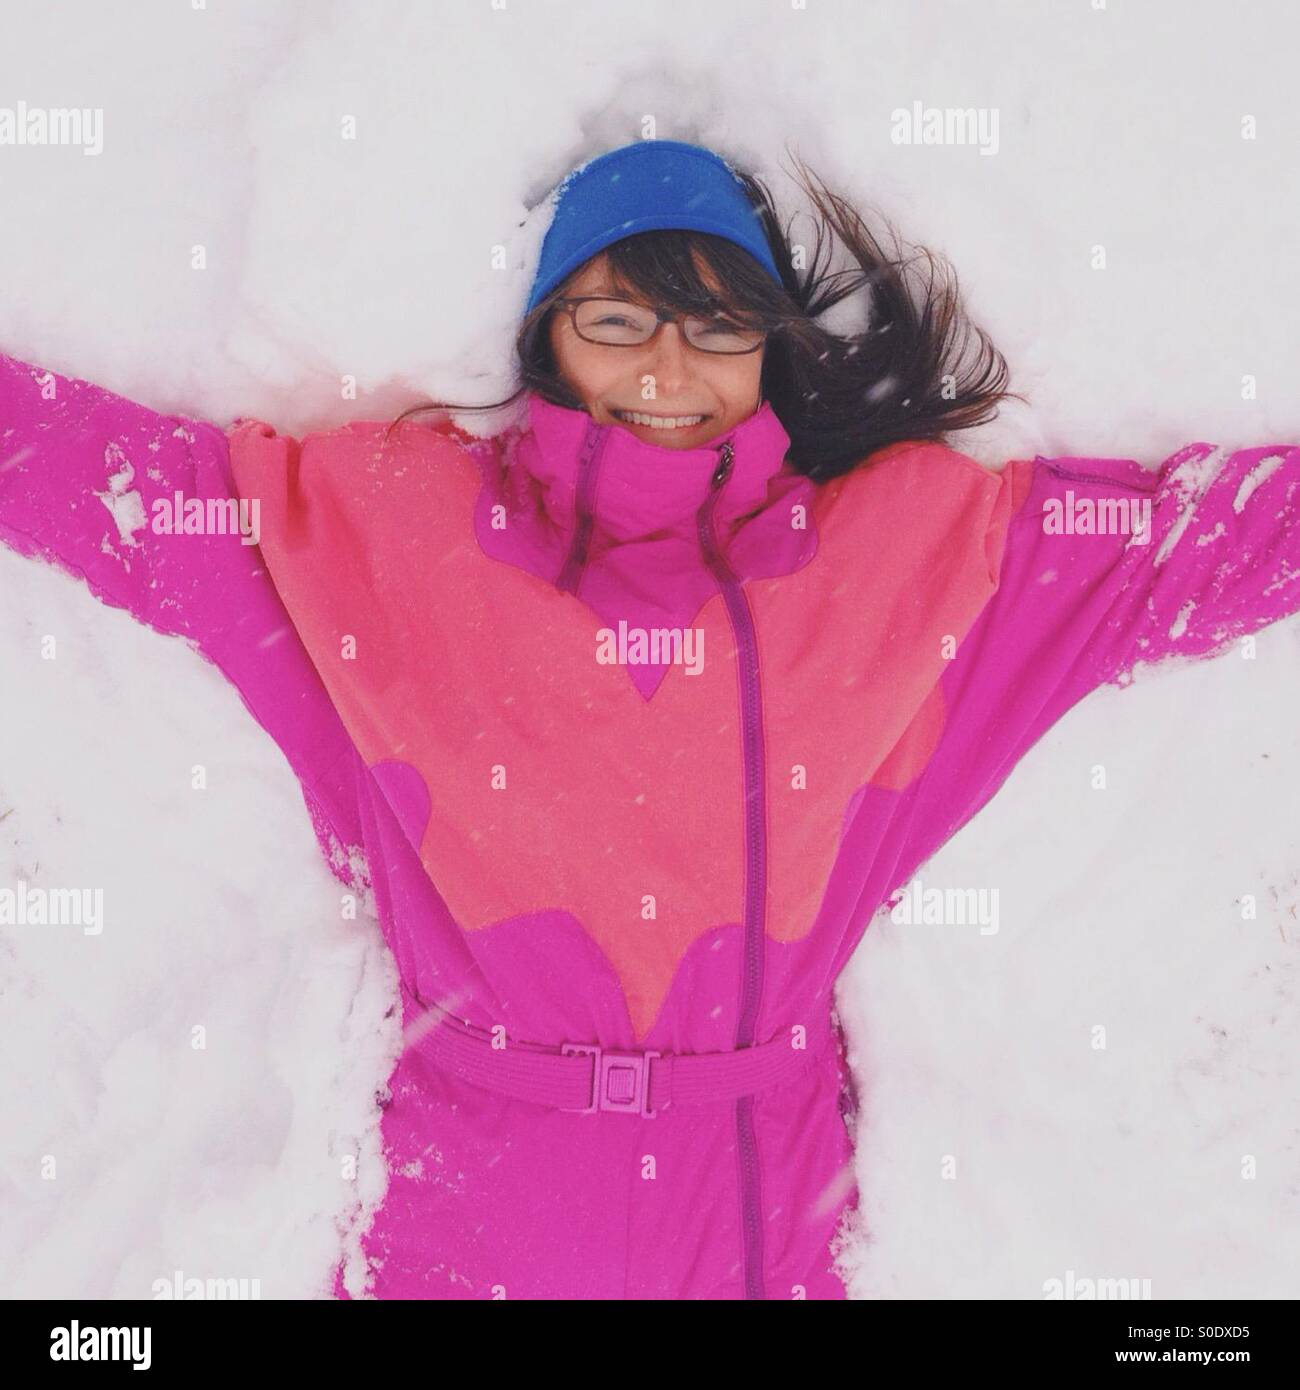 Snow Angel - Stock Image